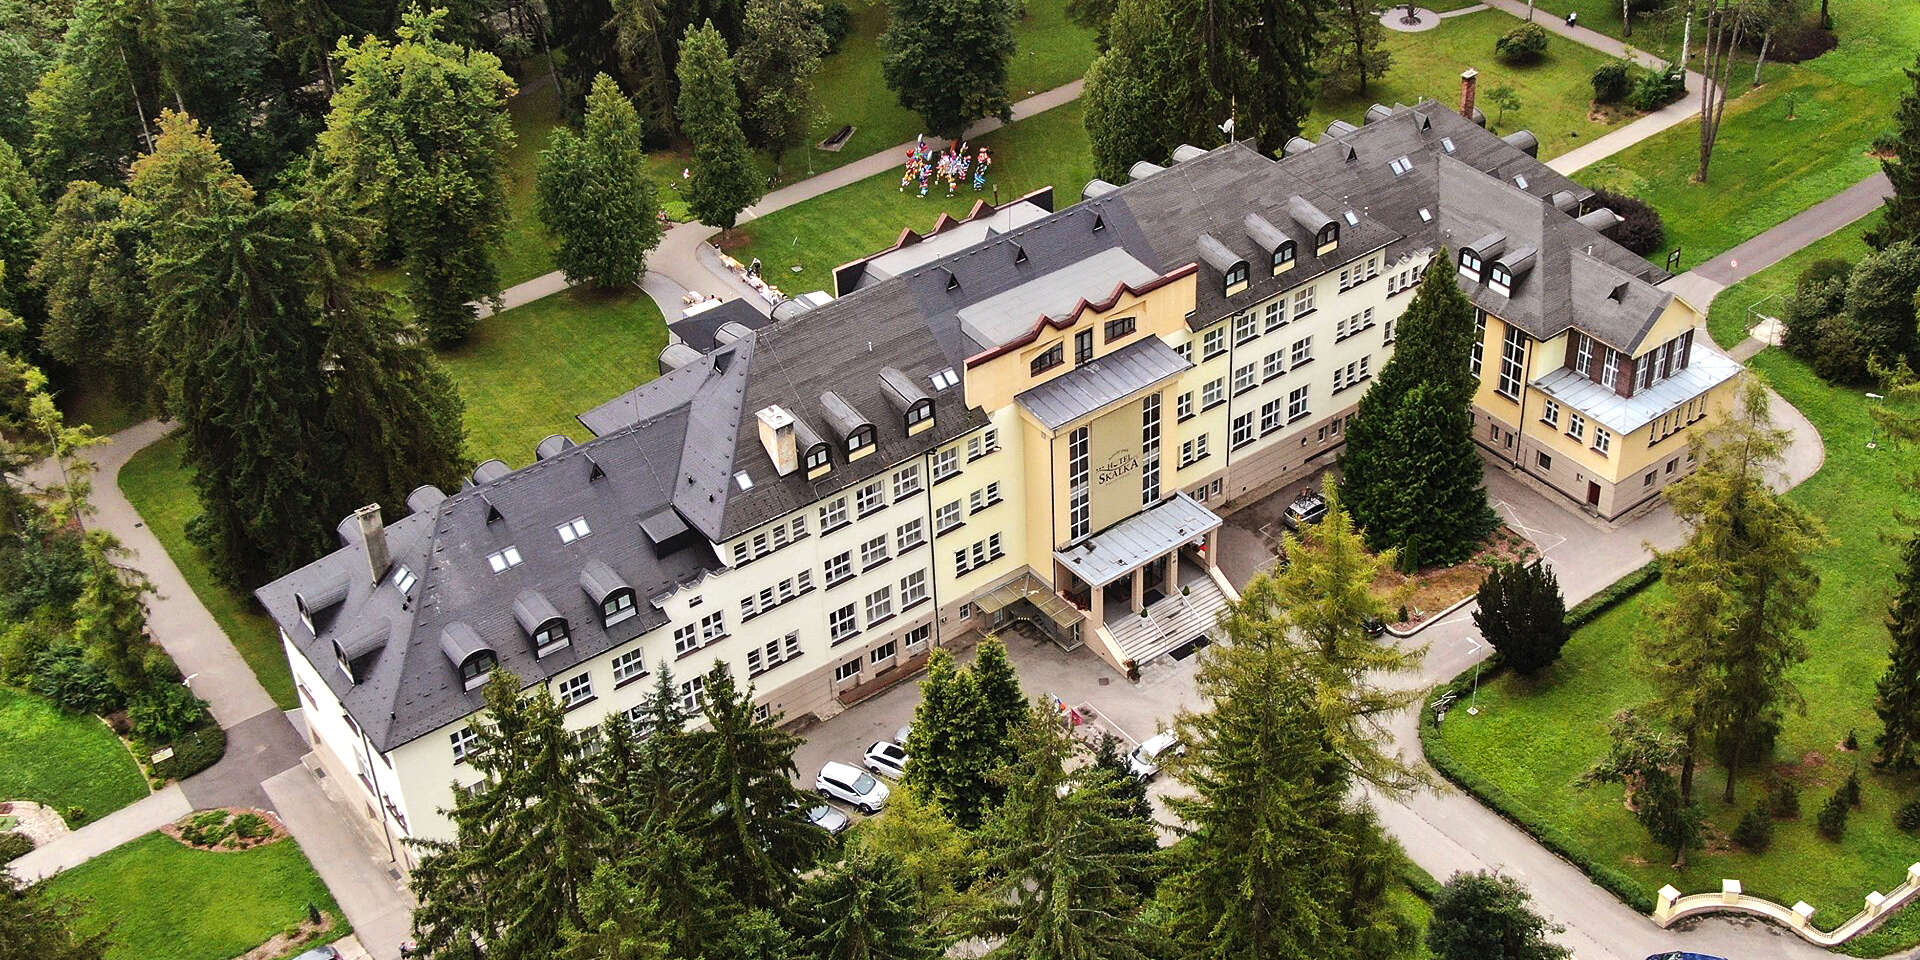 Vaša obľúbená voľba: Hotel Skalka*** v krásnom parčíku len 10 min. pešo od centra Rajeckých Teplíc